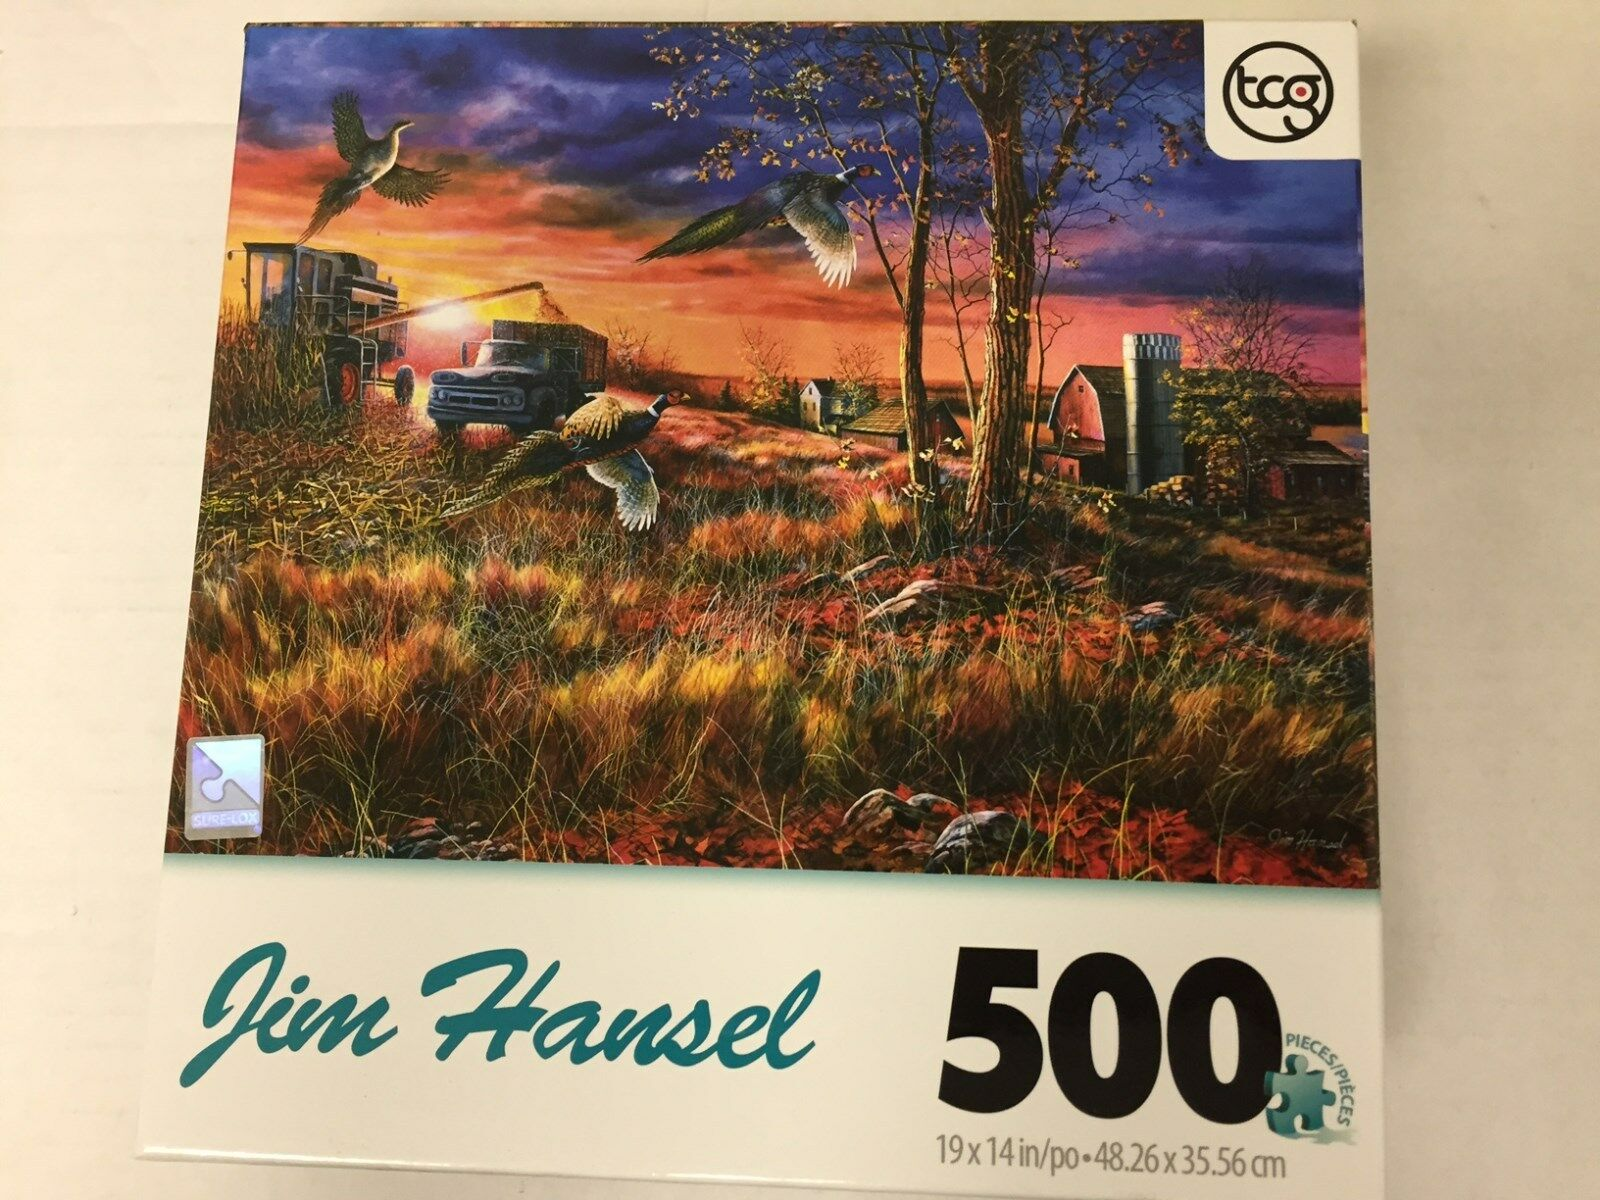 Jim Hansel HeadwatersJigsaw Puzzle 500-Piece